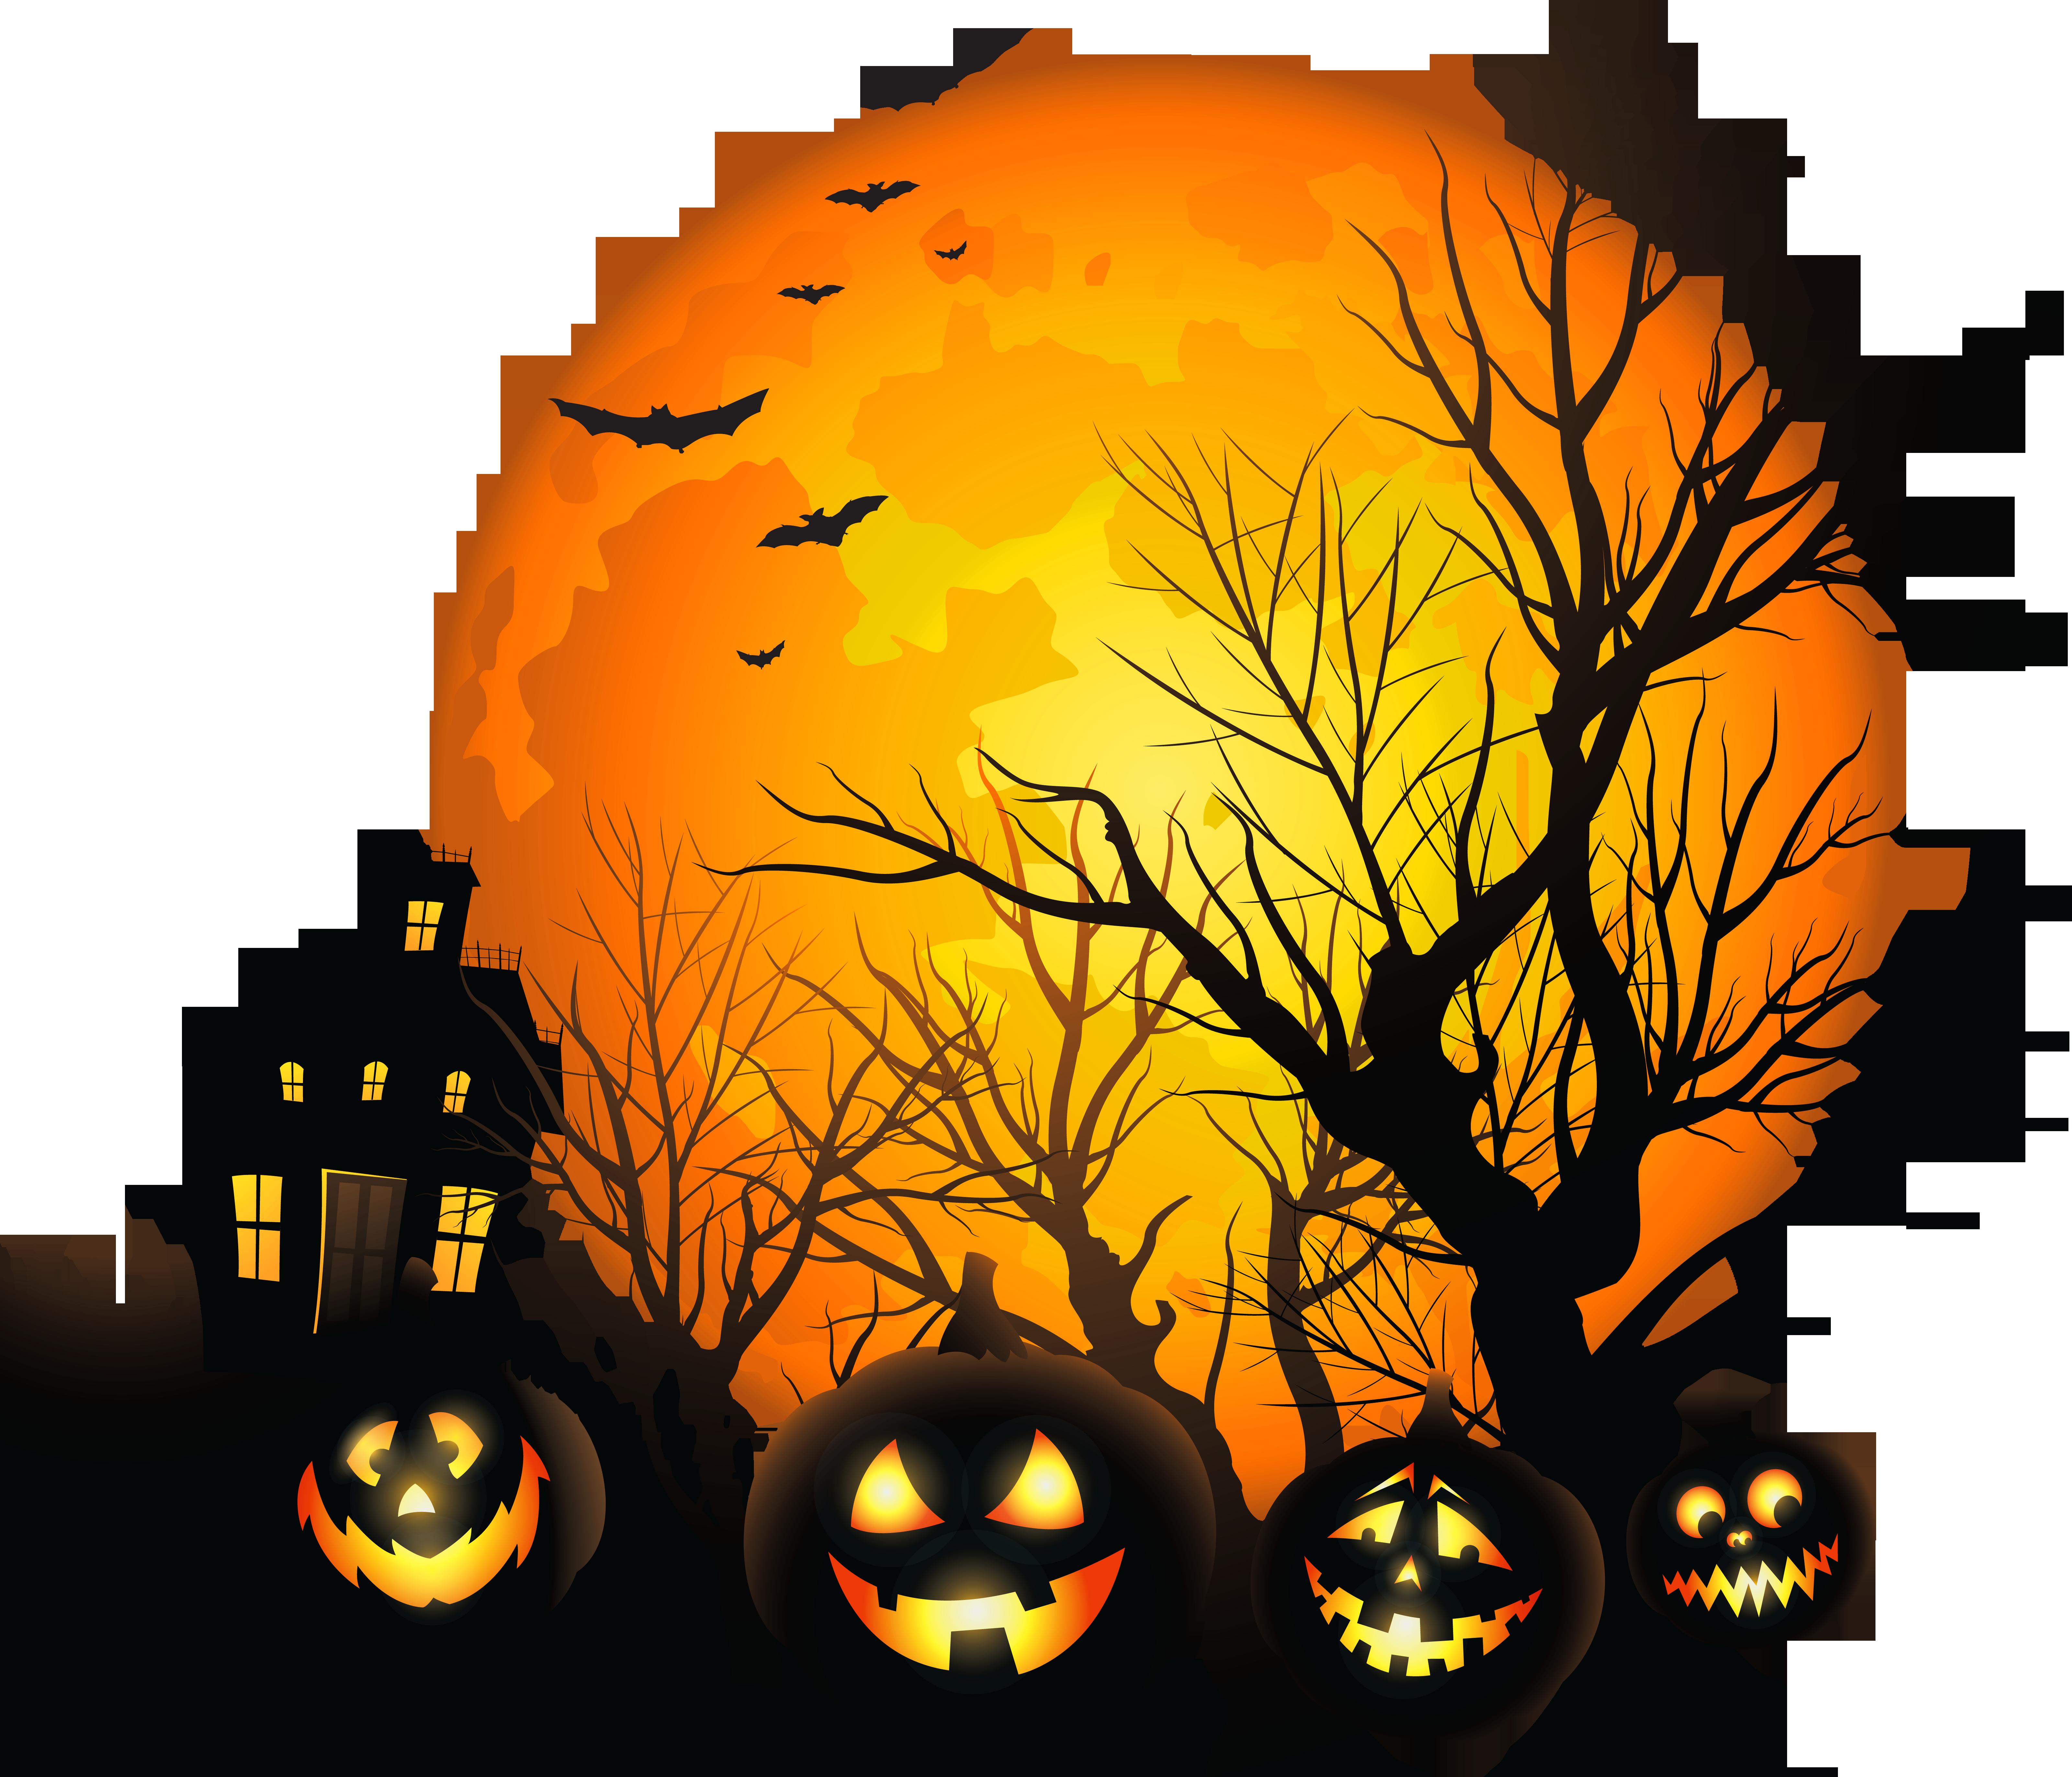 Bat house clipart vector library Sun, Bat, Pumpkin, Tree, Night, Halloween Clipart Png - 3936 ... vector library